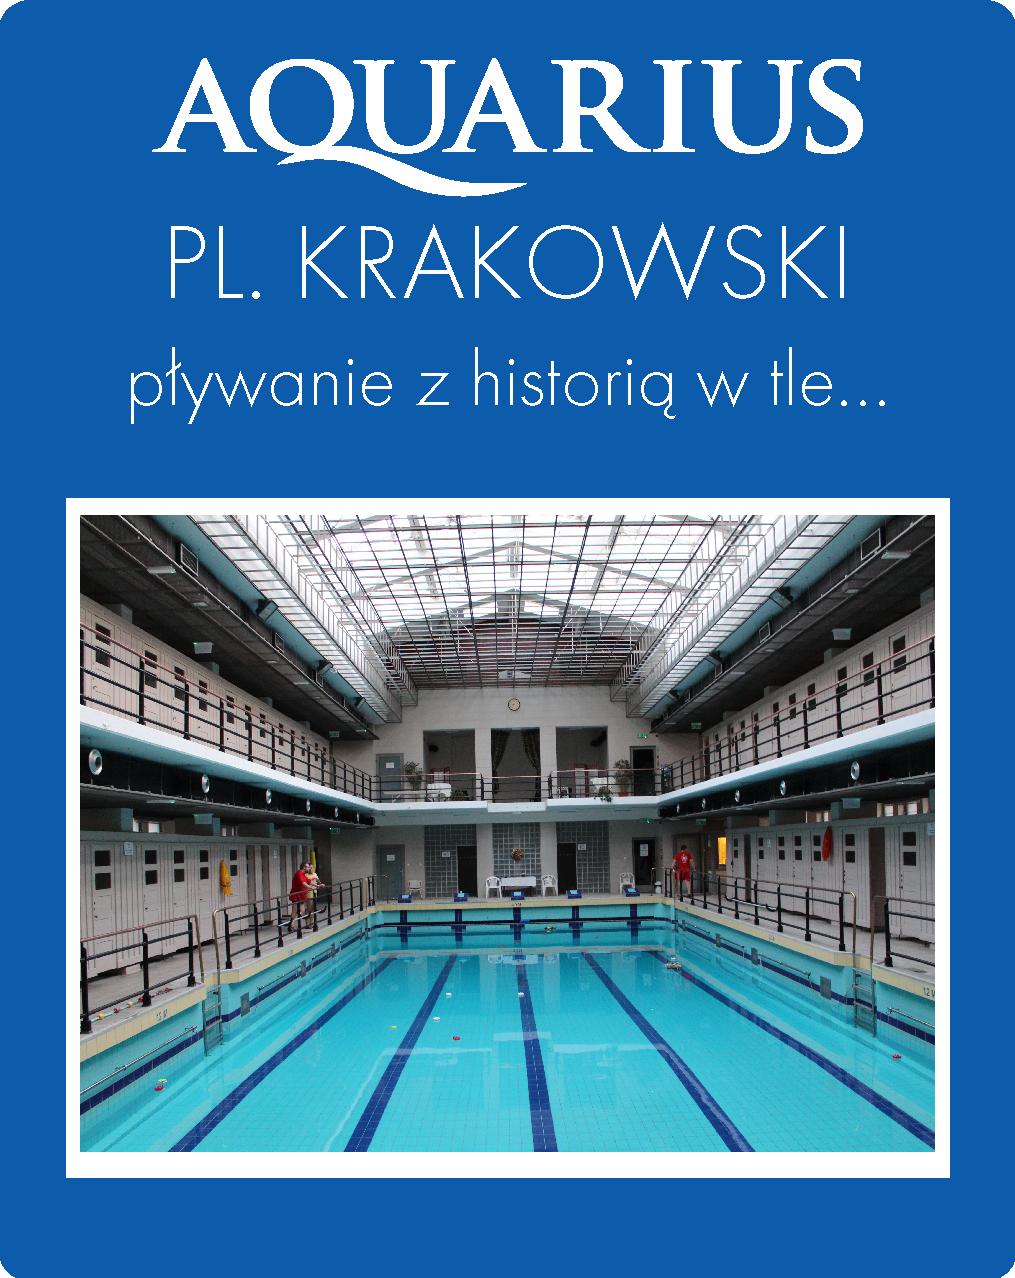 plac krakowski-02